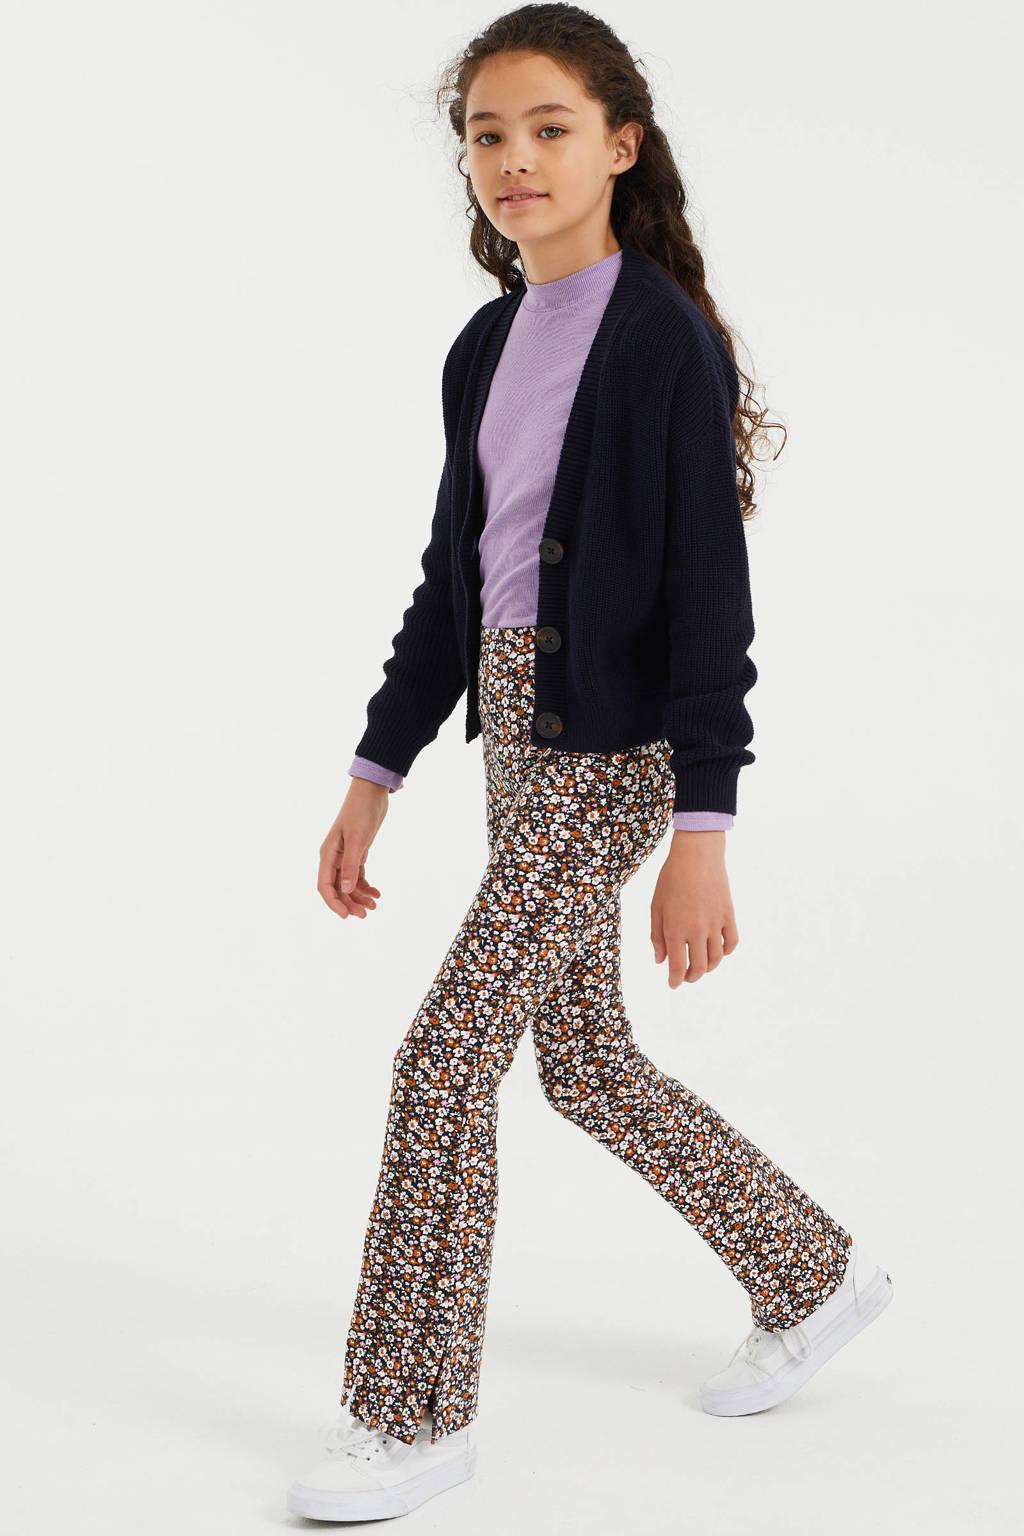 WE Fashion gebloemde flared broek donkerblauw/oranje/wit, Donkerblauw/oranje/wit